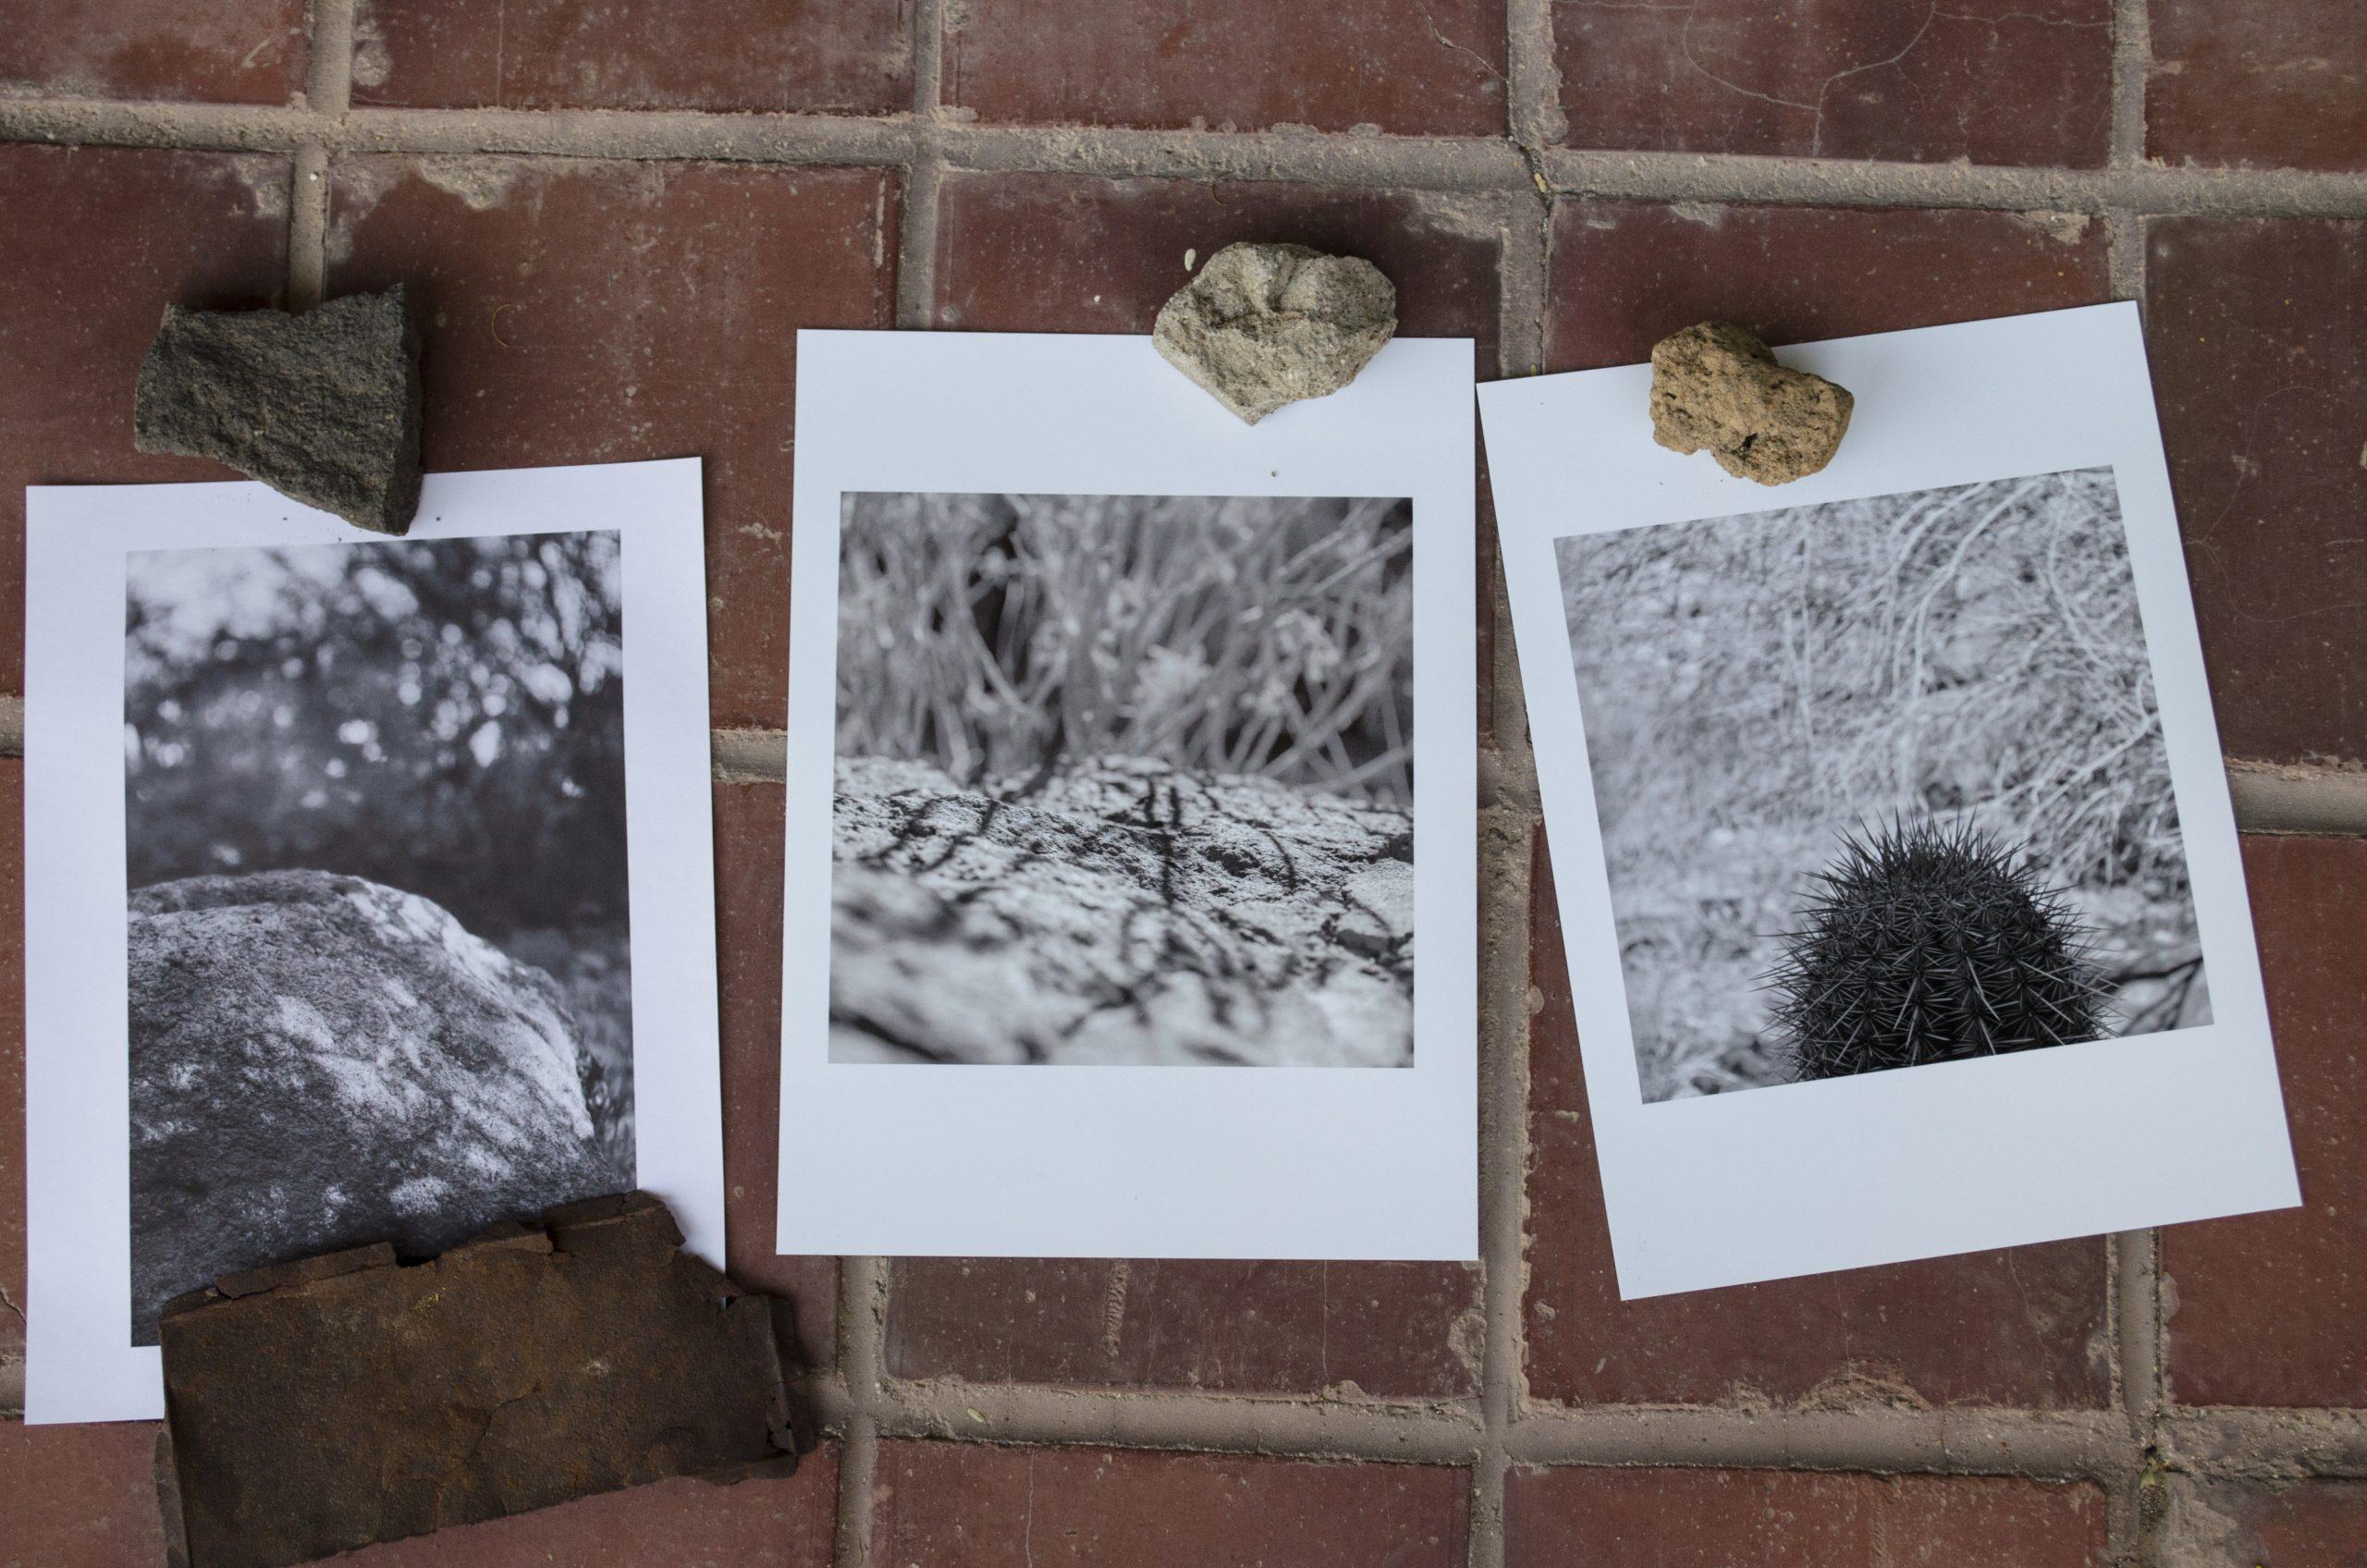 Photographs, Plot #10 by Paul Mirocha